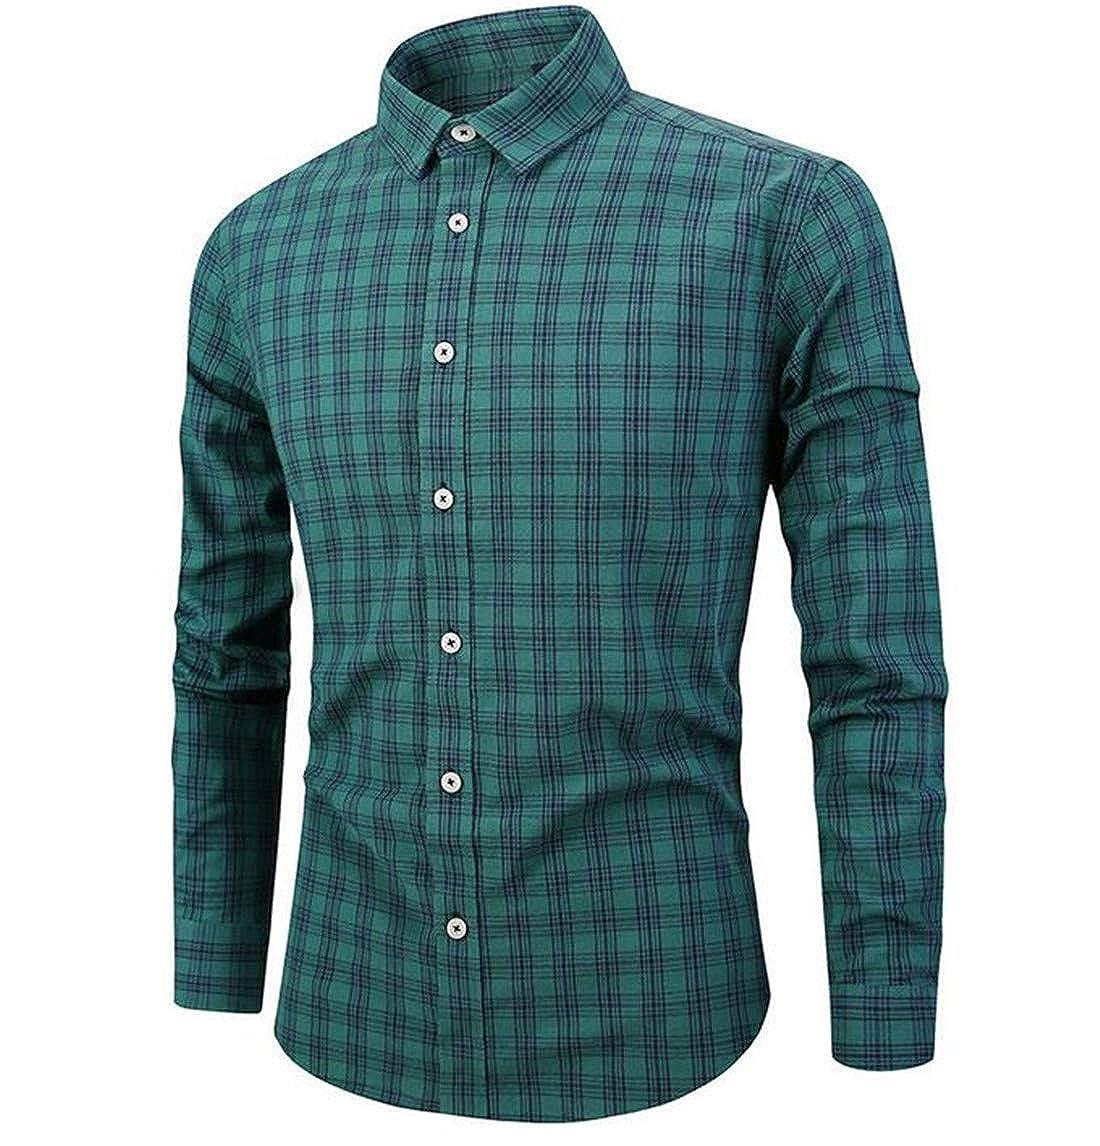 KLJR Men Slim-Fit Plaid Long Sleeve Button Down Dress Shirts